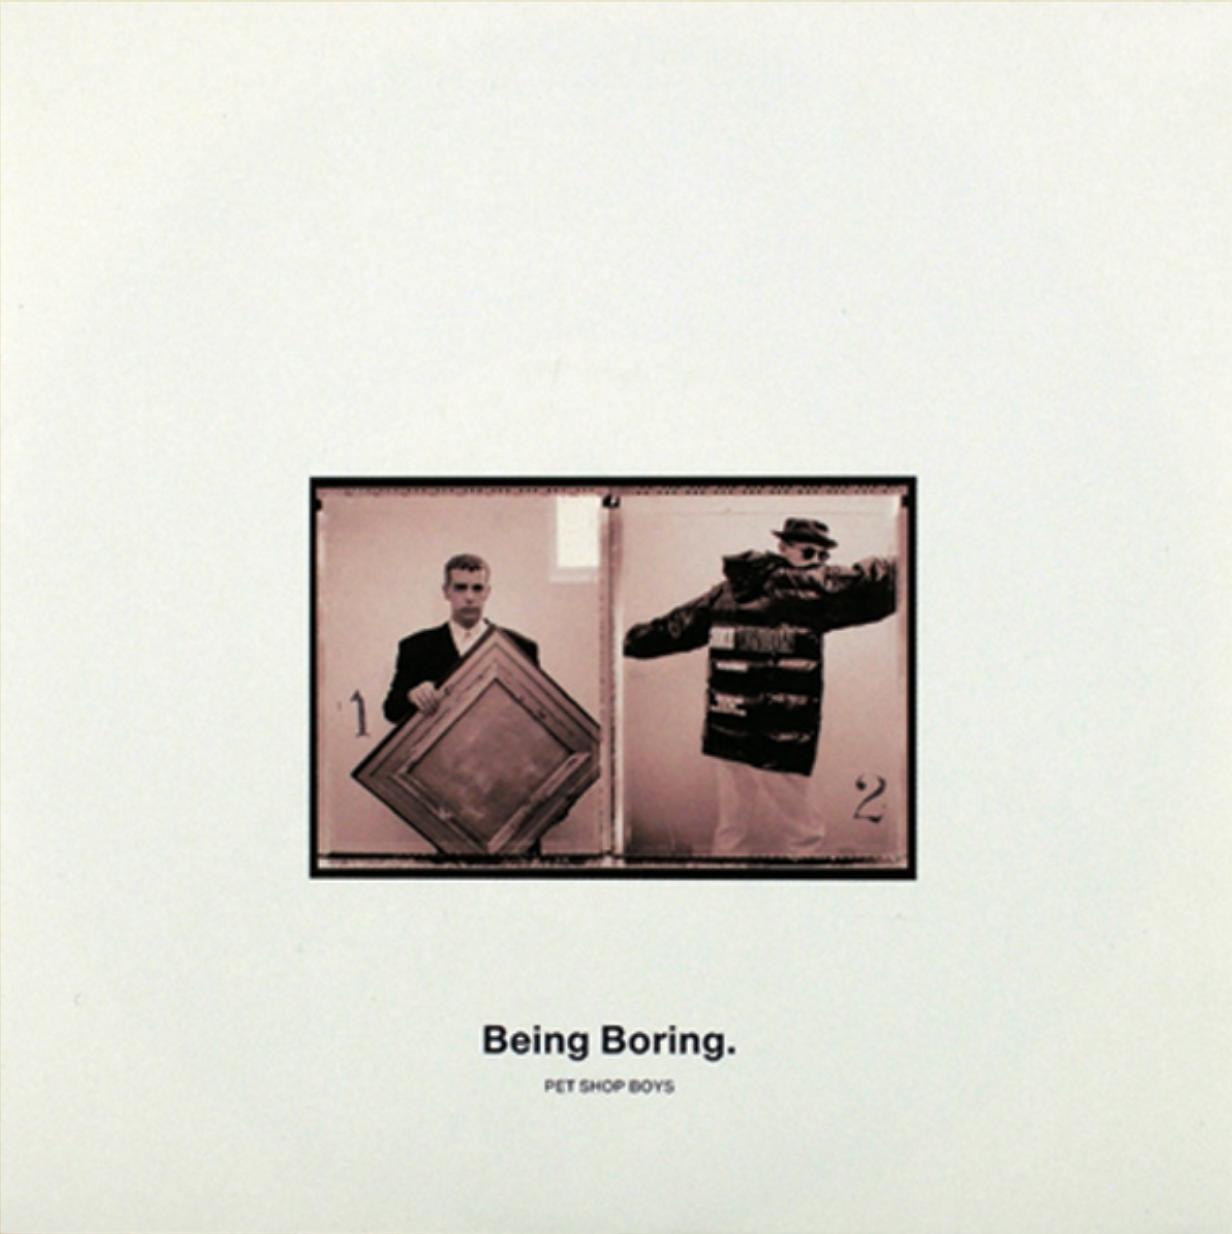 The Lowdown: Pet Shop Boys - Being Boring